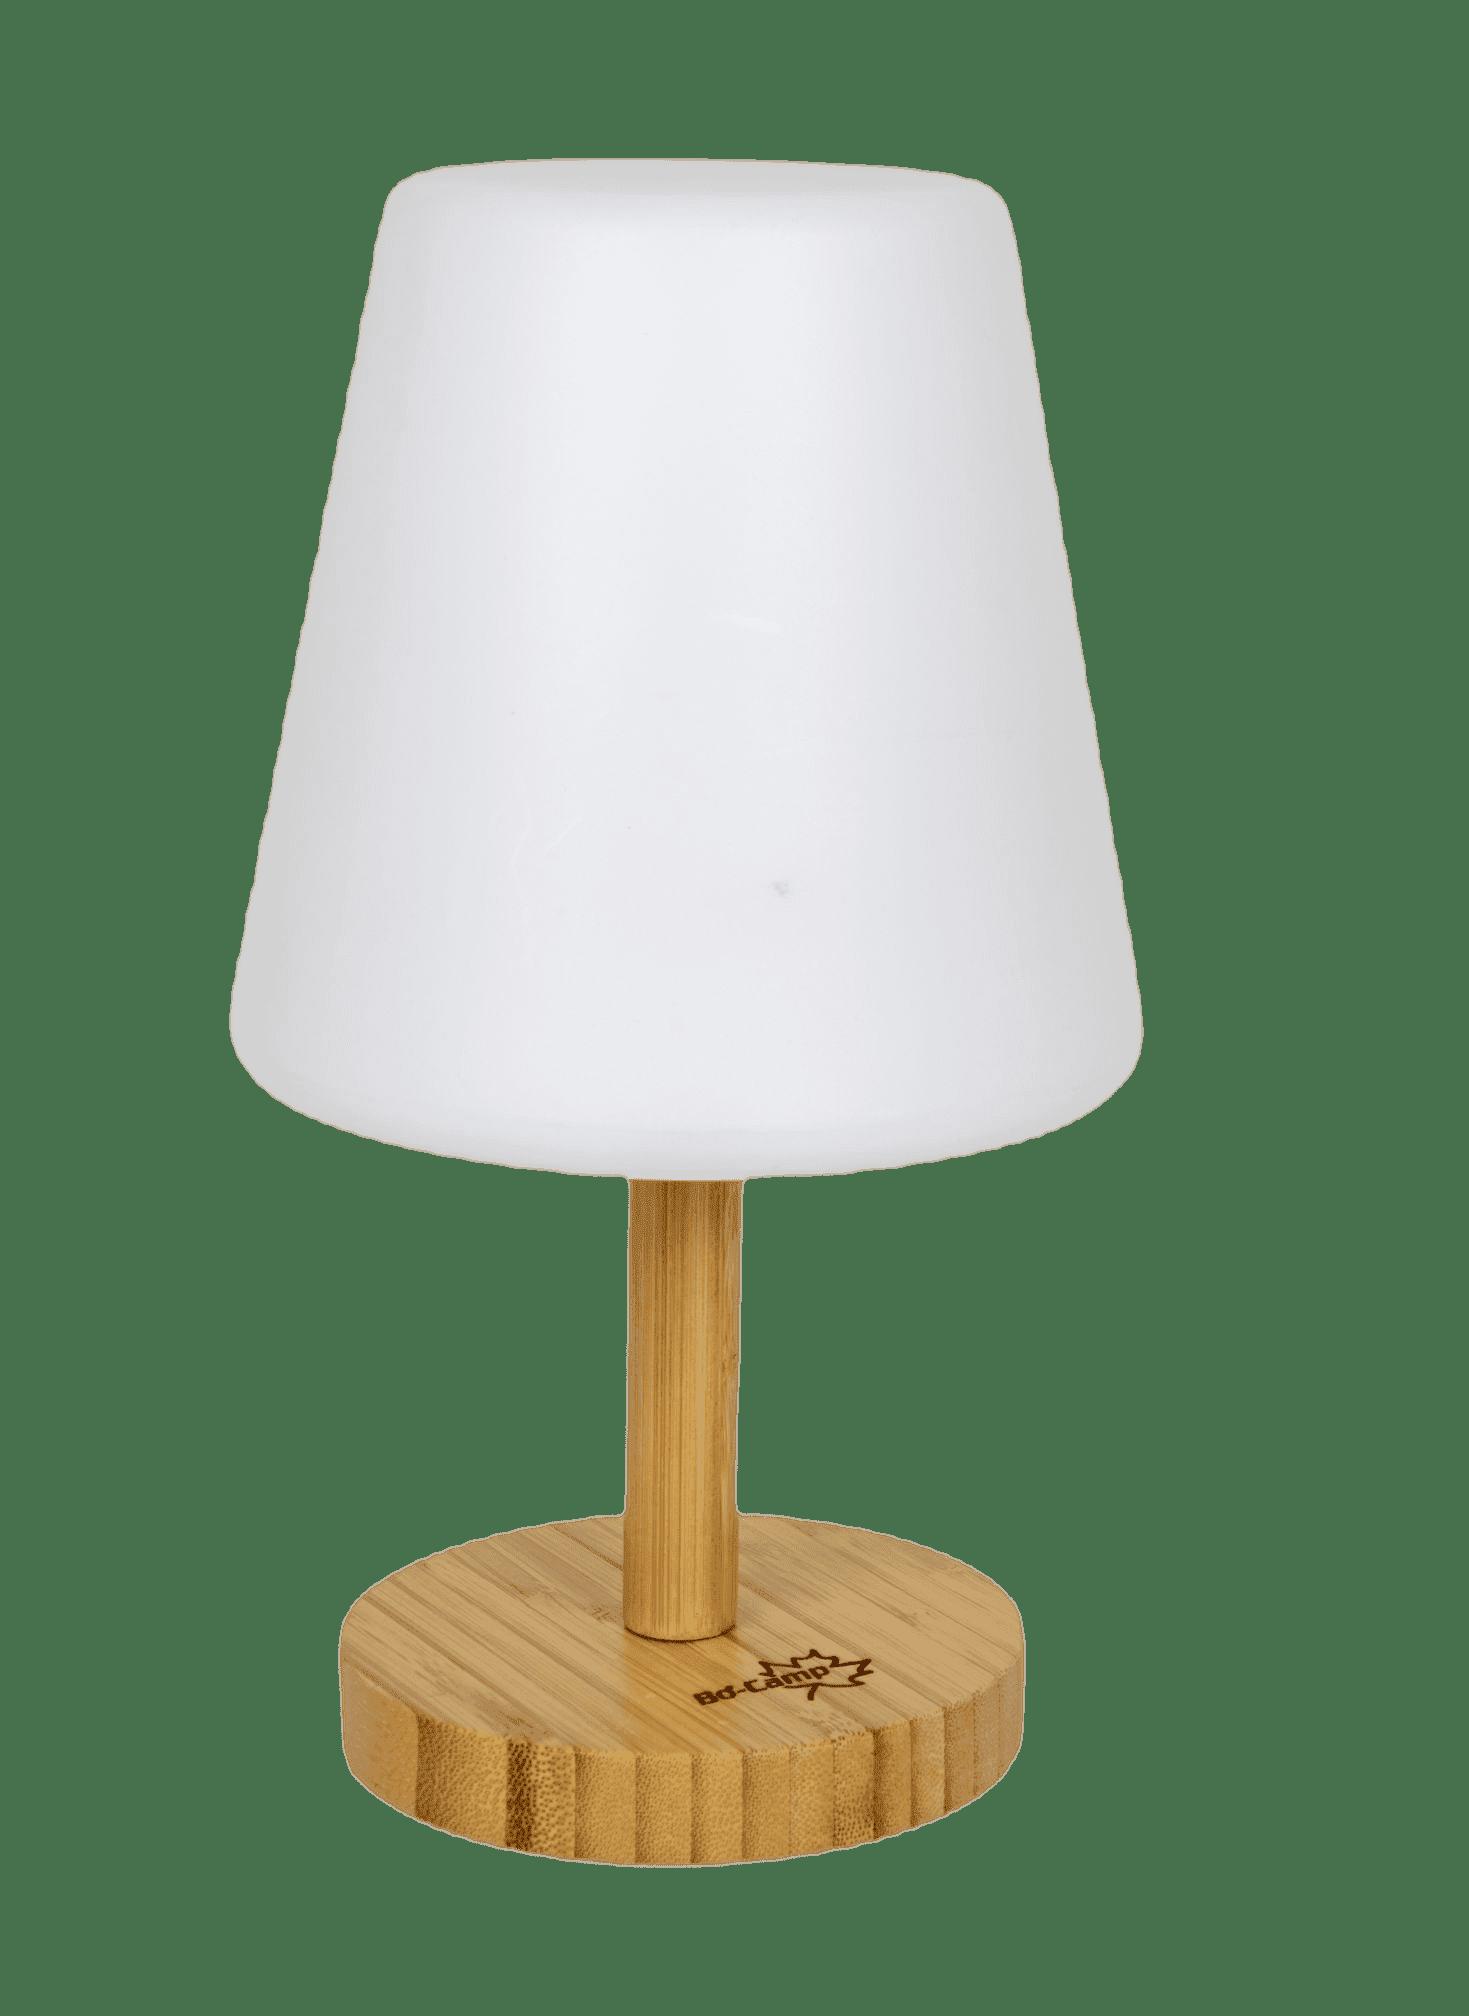 Tafellamp cambridge